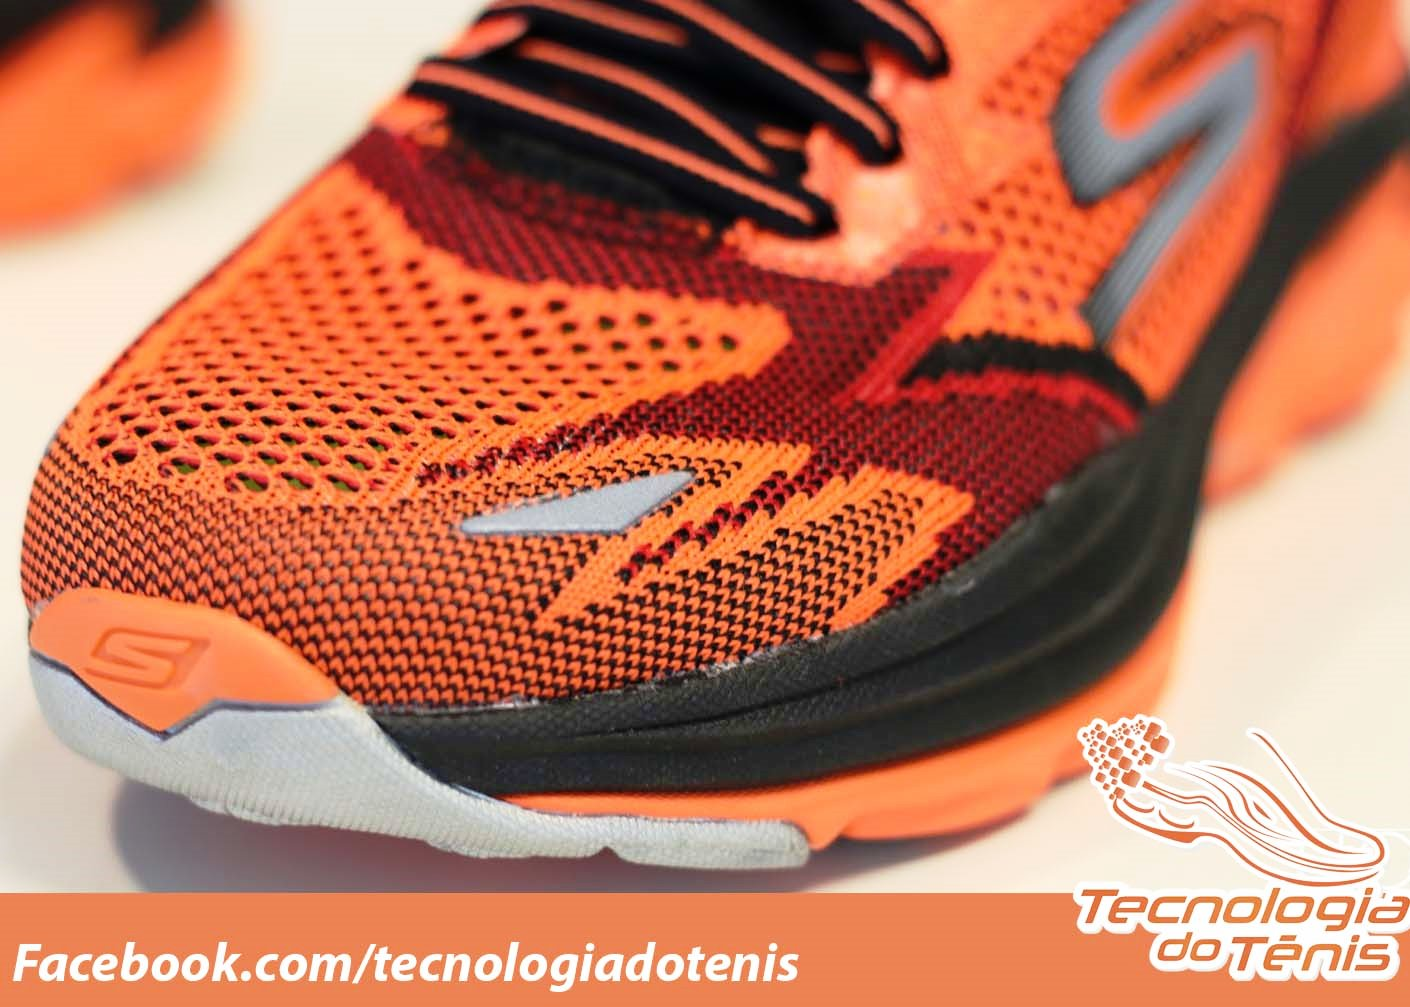 Tecnologia do Tenis - Ultra Road-